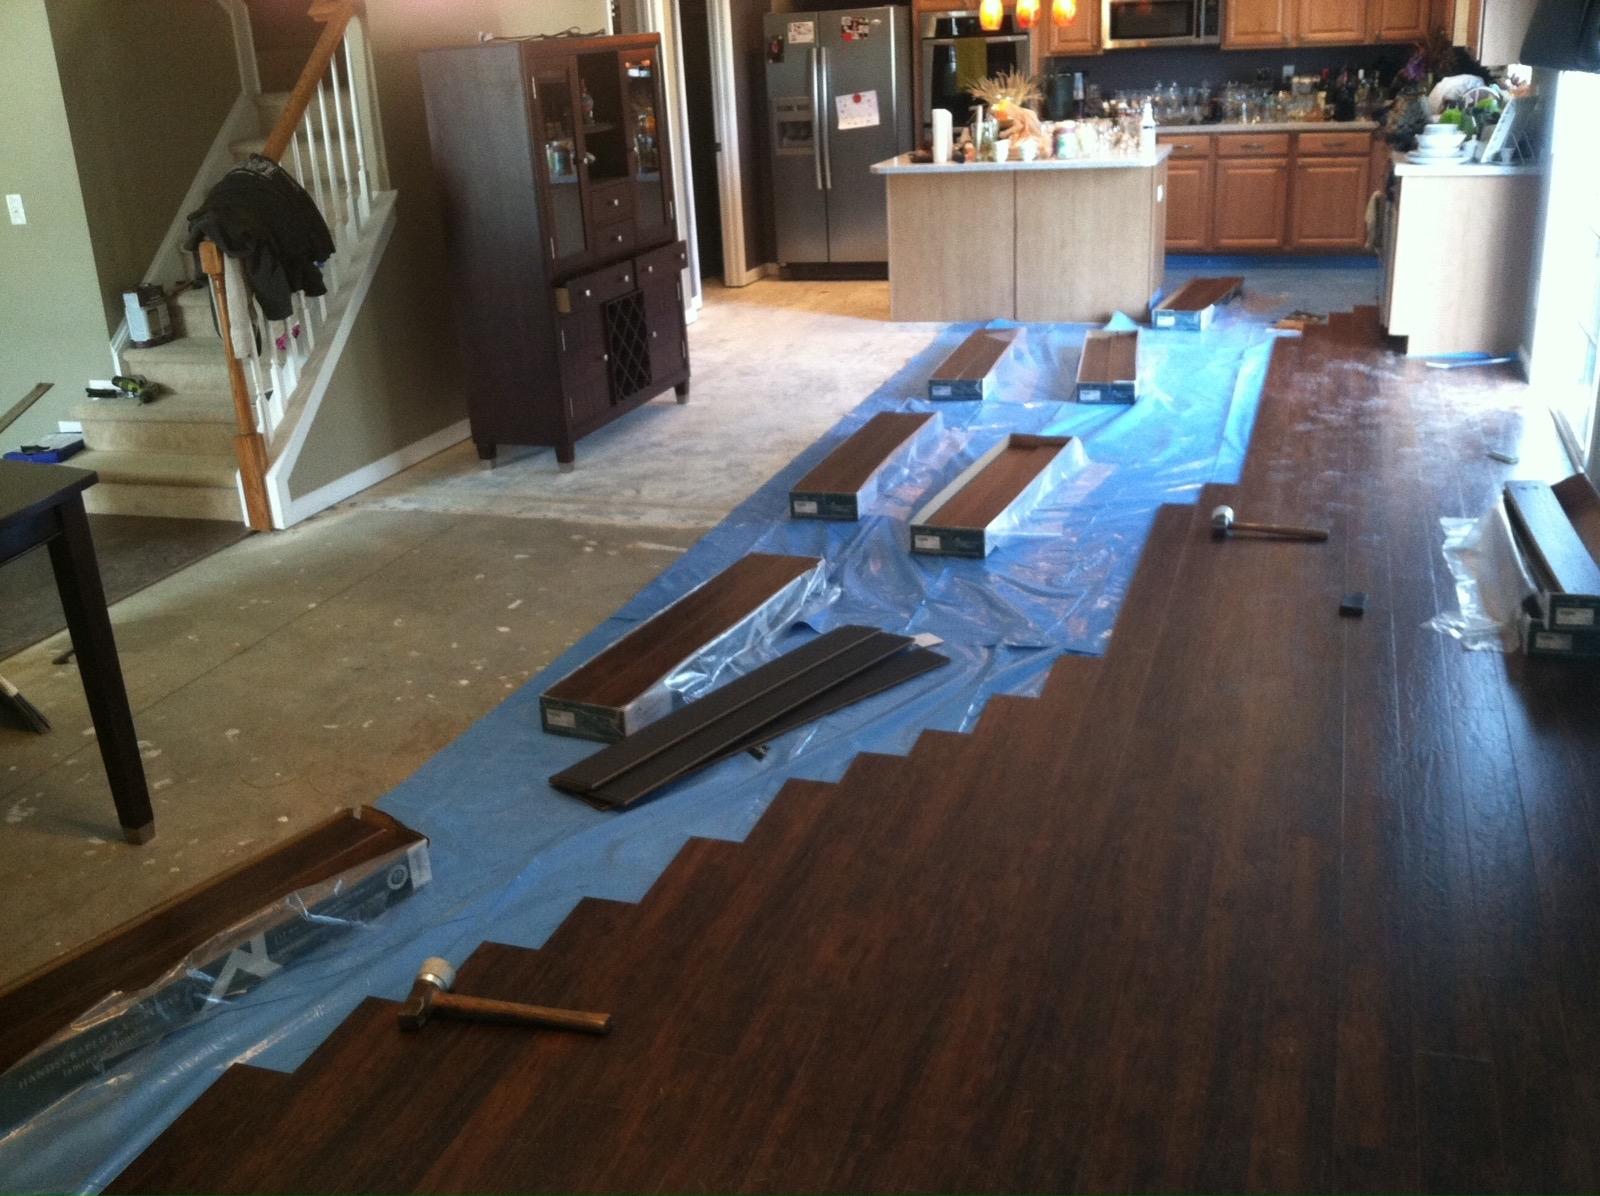 Vapor Barrier On Concrete Slab, Water Barrier For Laminate Flooring